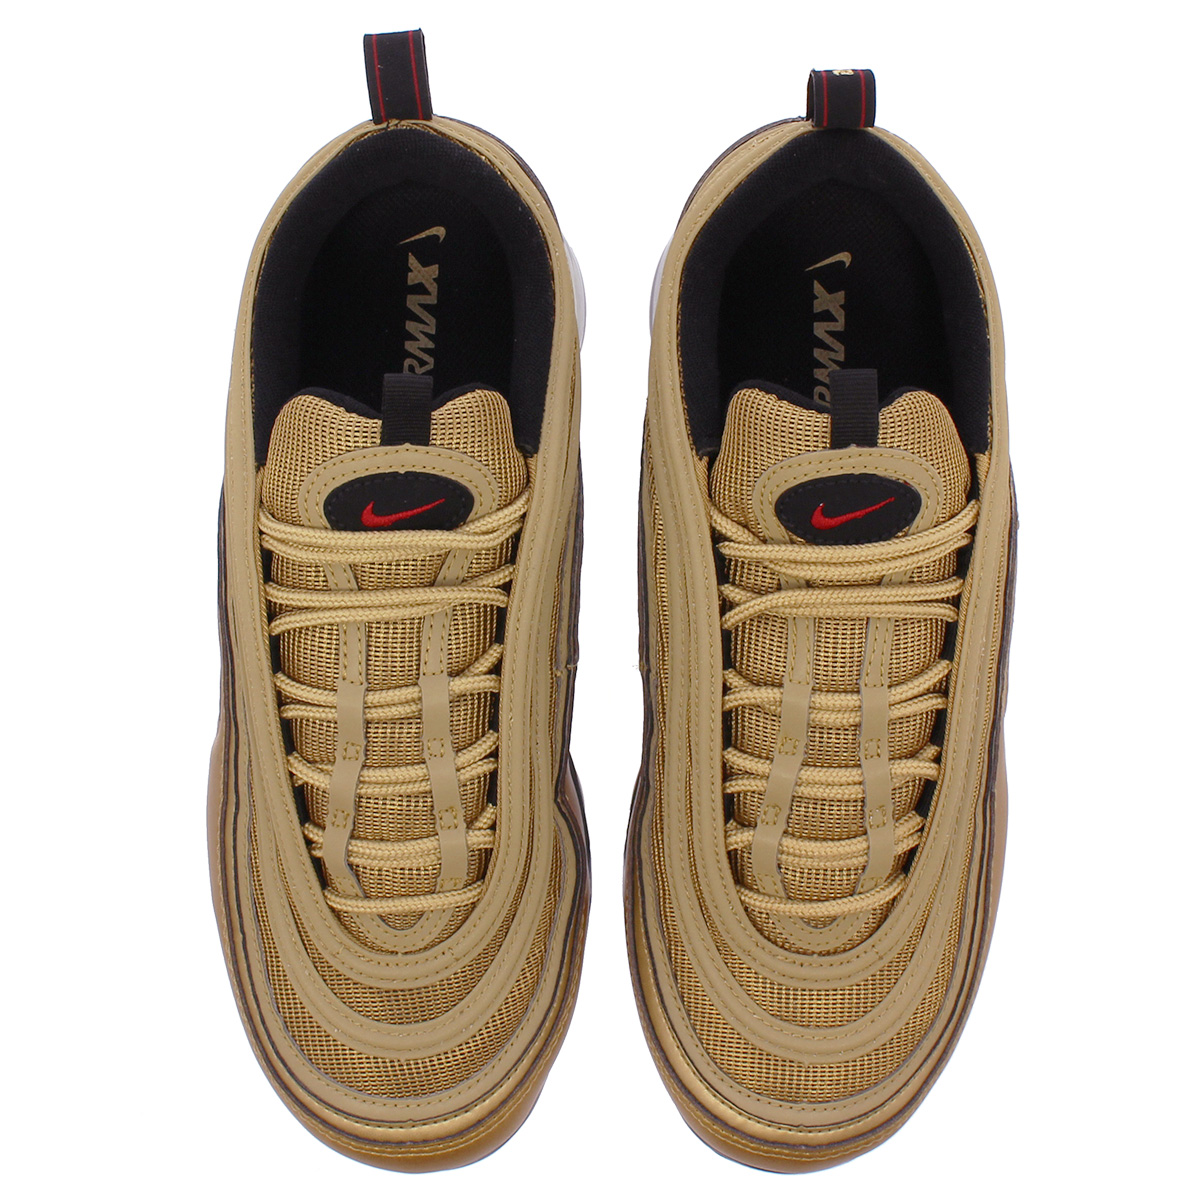 410328491d9 NIKE AIR VAPORMAX 97 Nike air vapor max 97 METALLIC GOLD VARSITY RED BLACK WHITE  aj7291-700